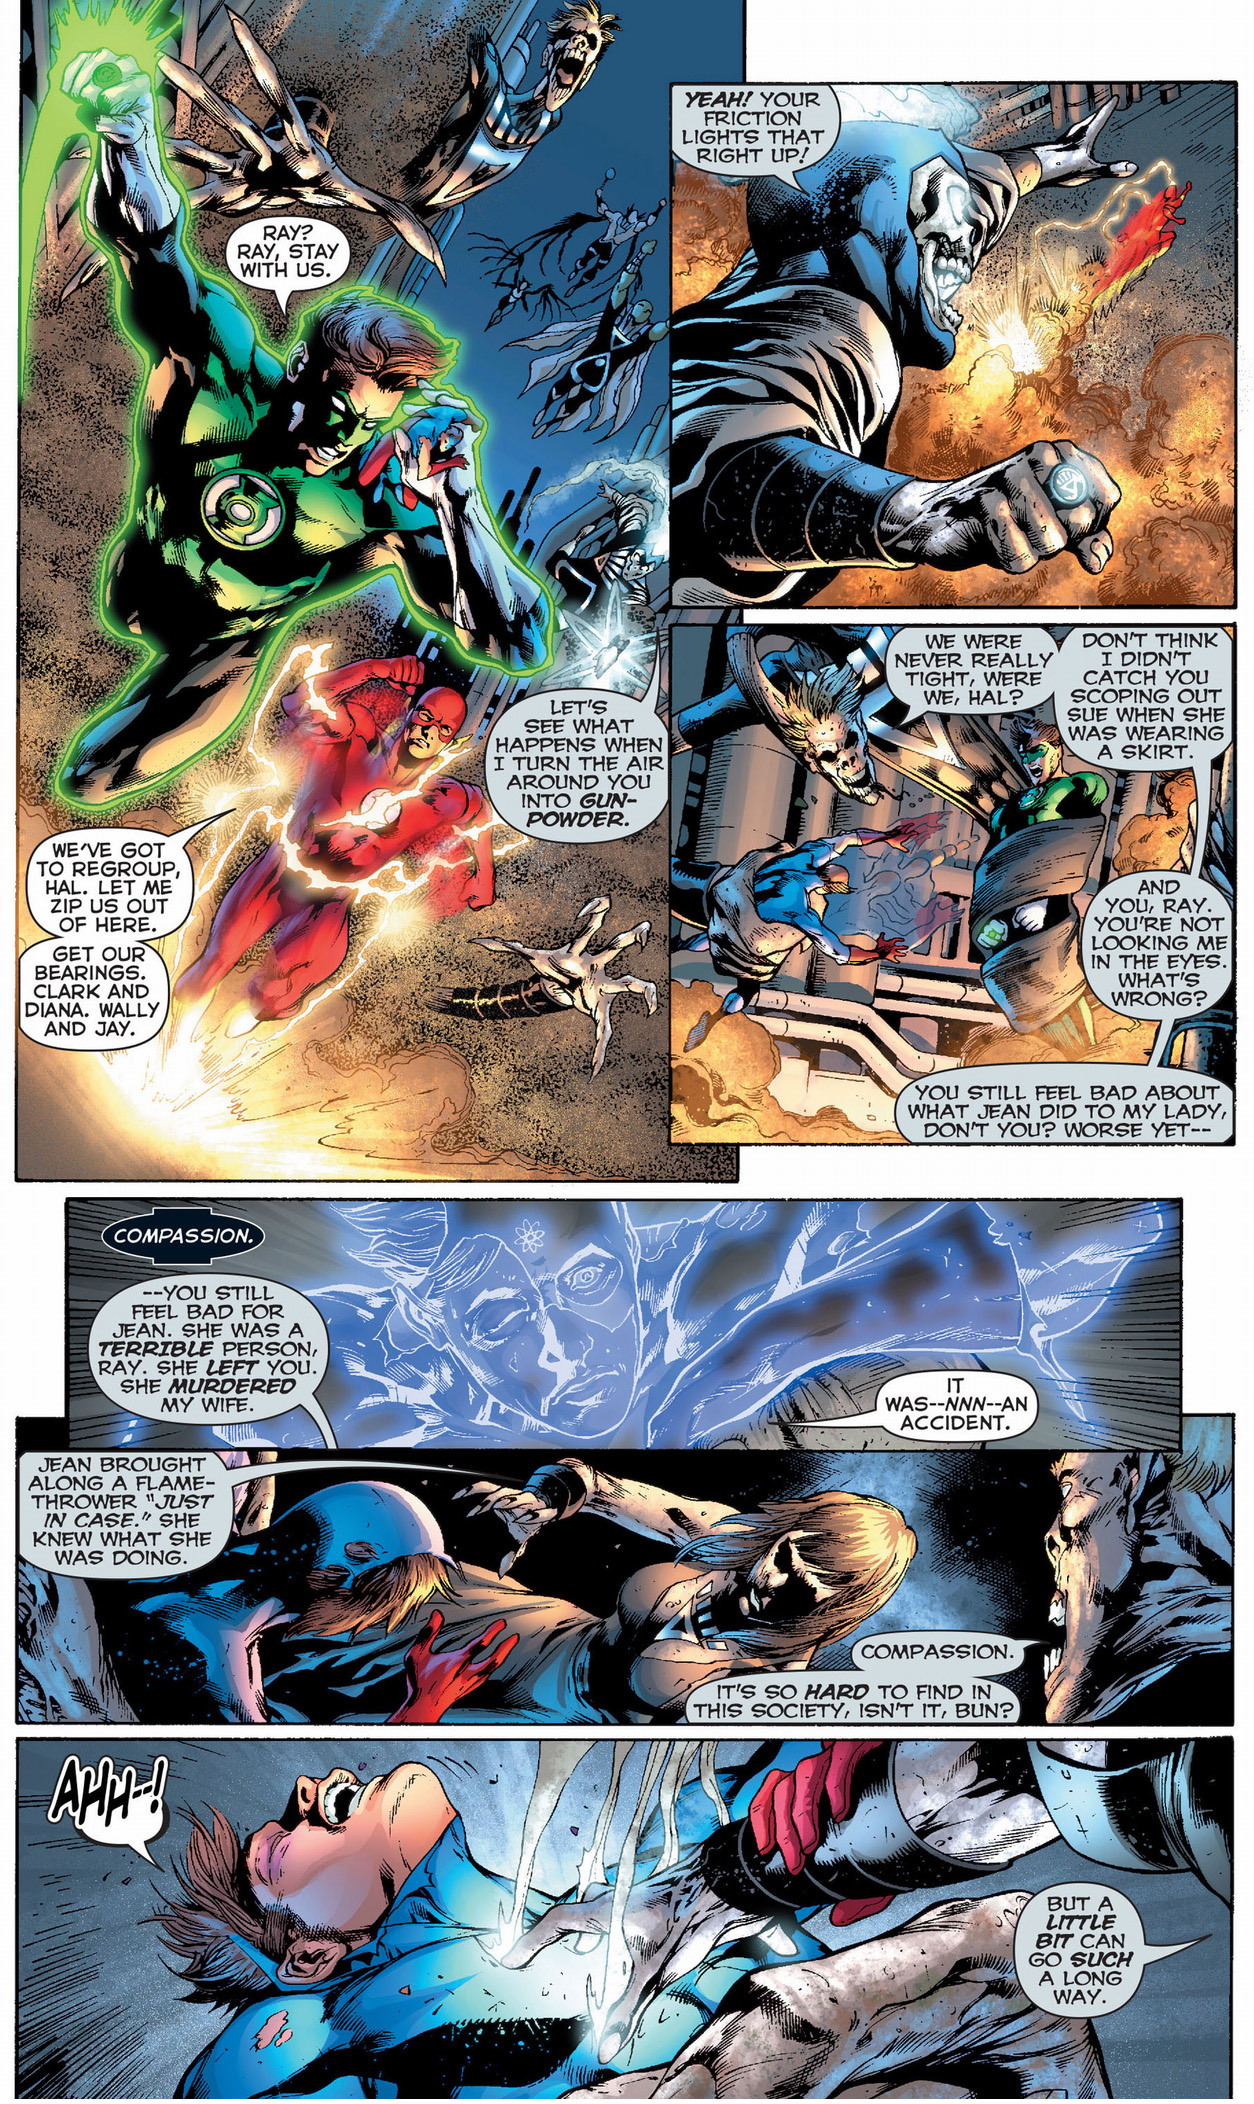 green lantern, the atom and the flash vs black lantern justice league